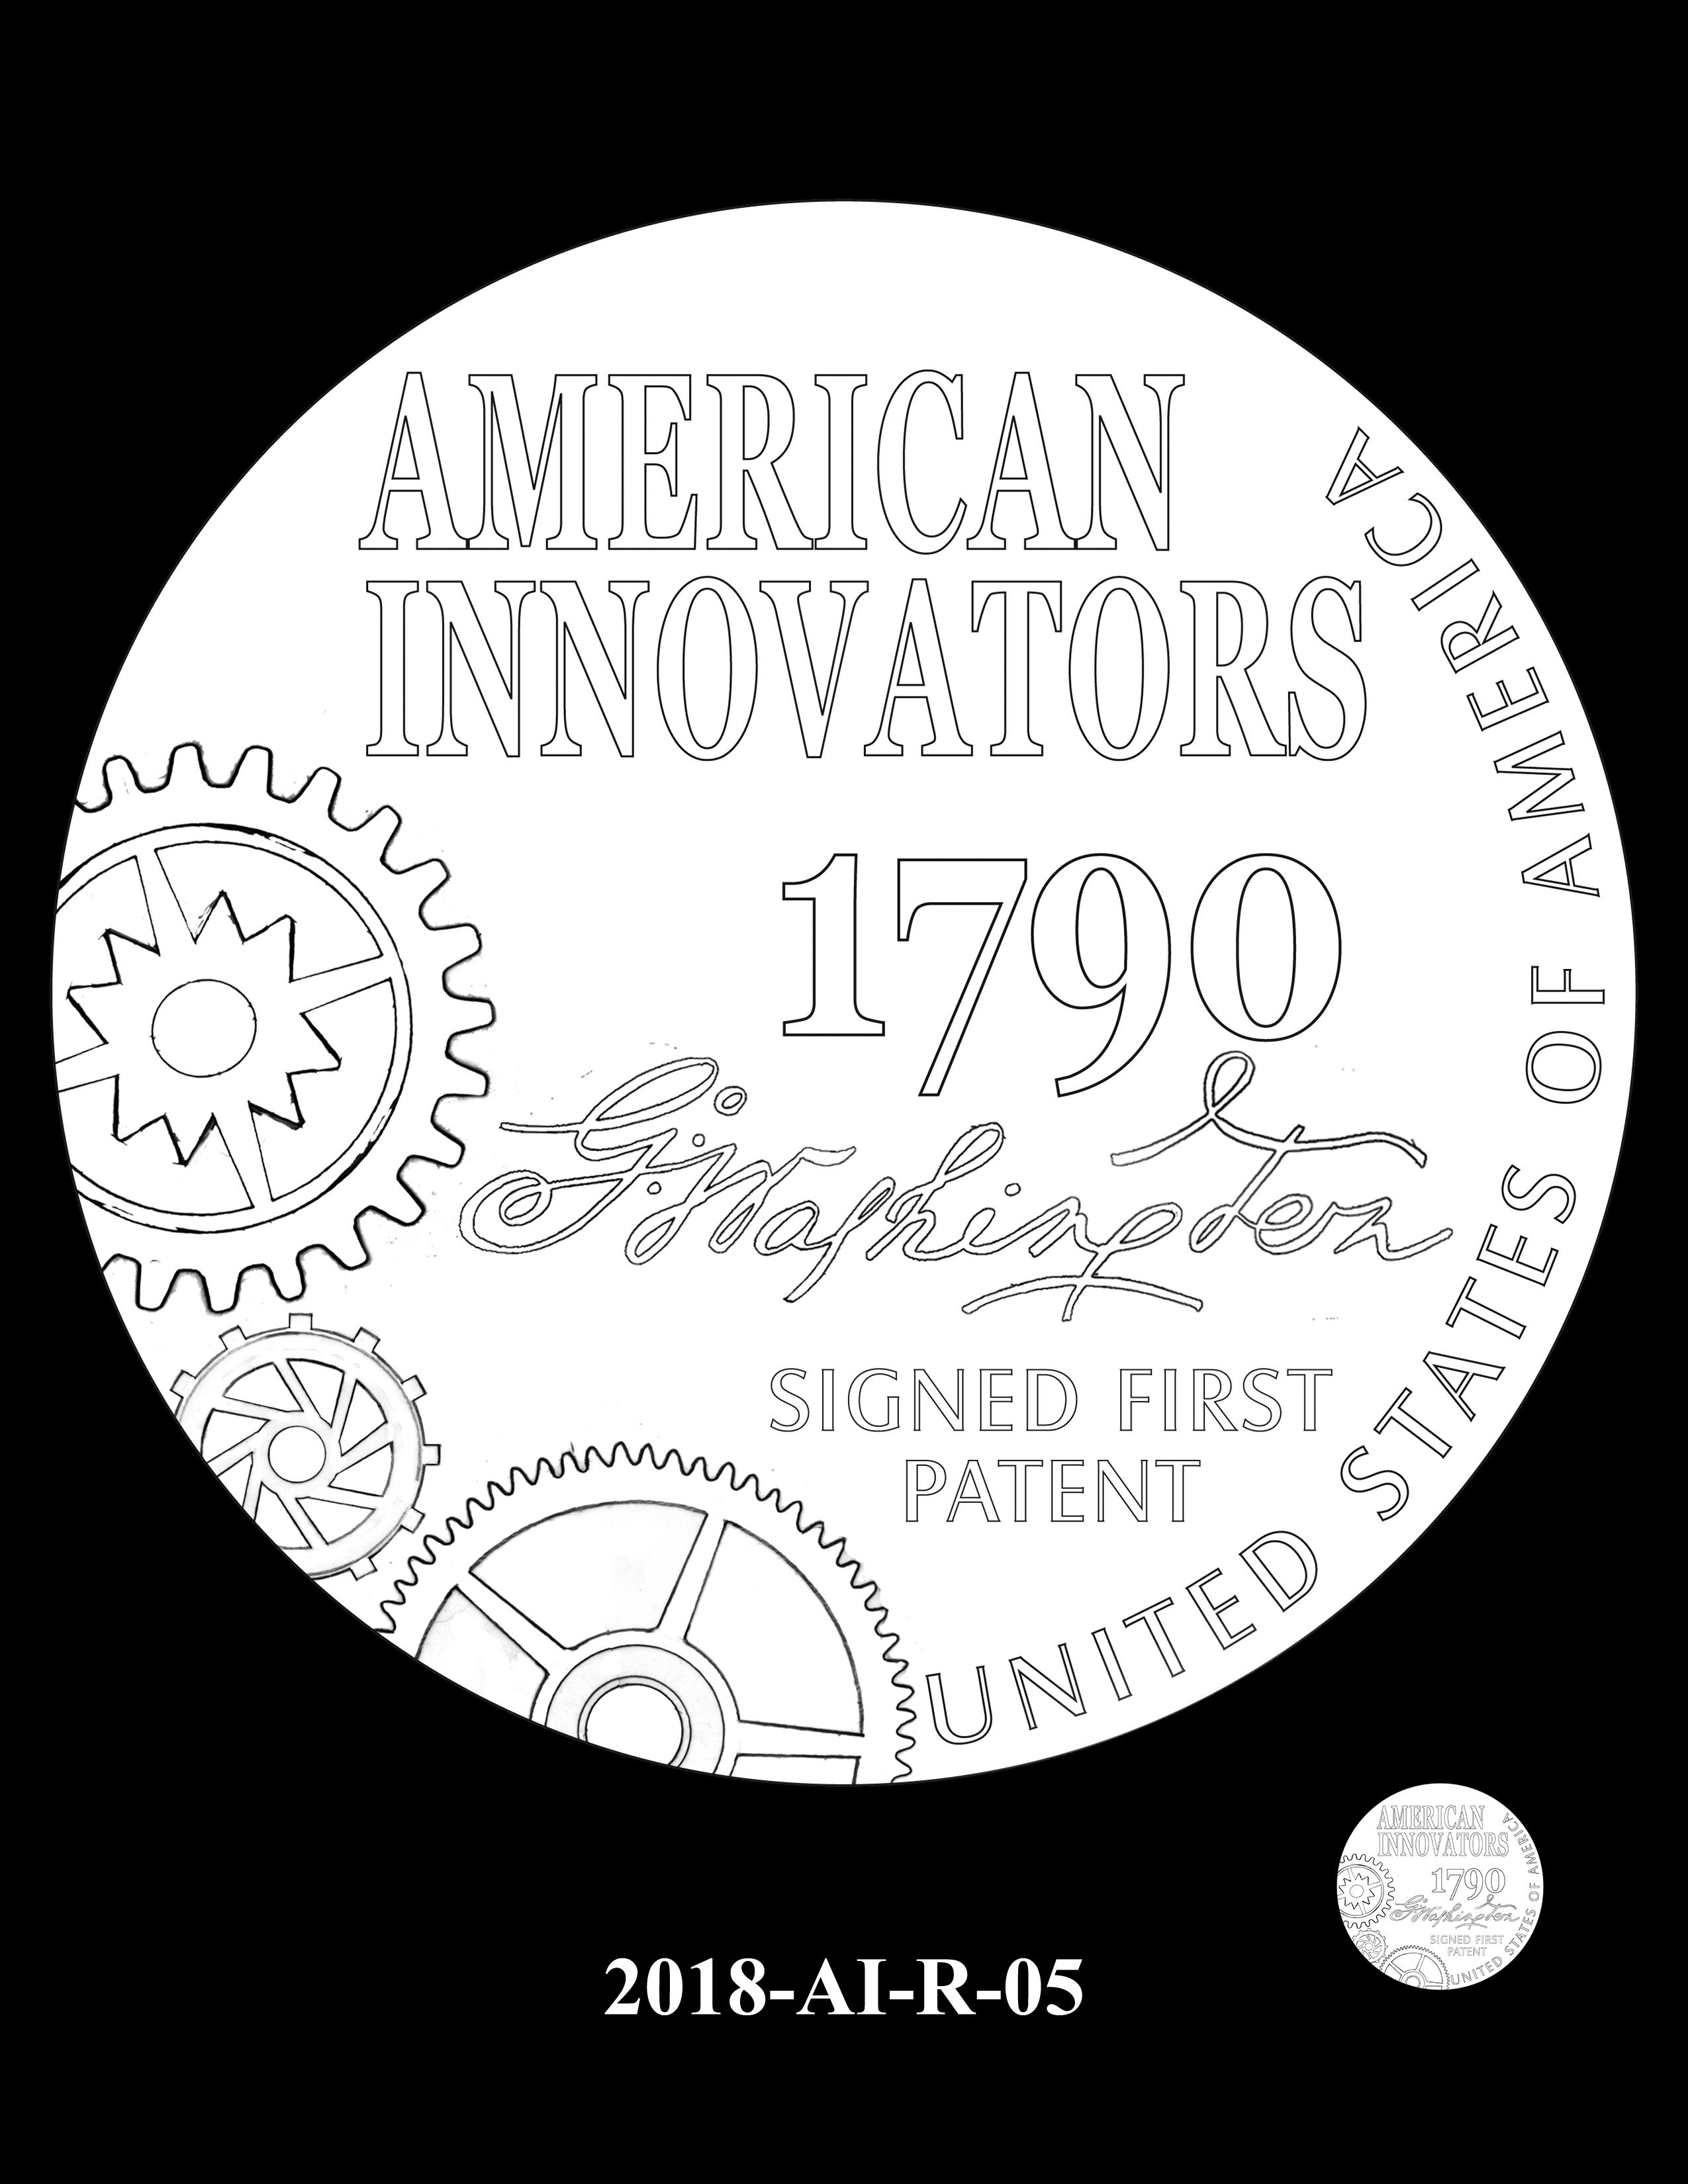 2018-AI-R-05 -- 2018 American Innovation $1 Coin